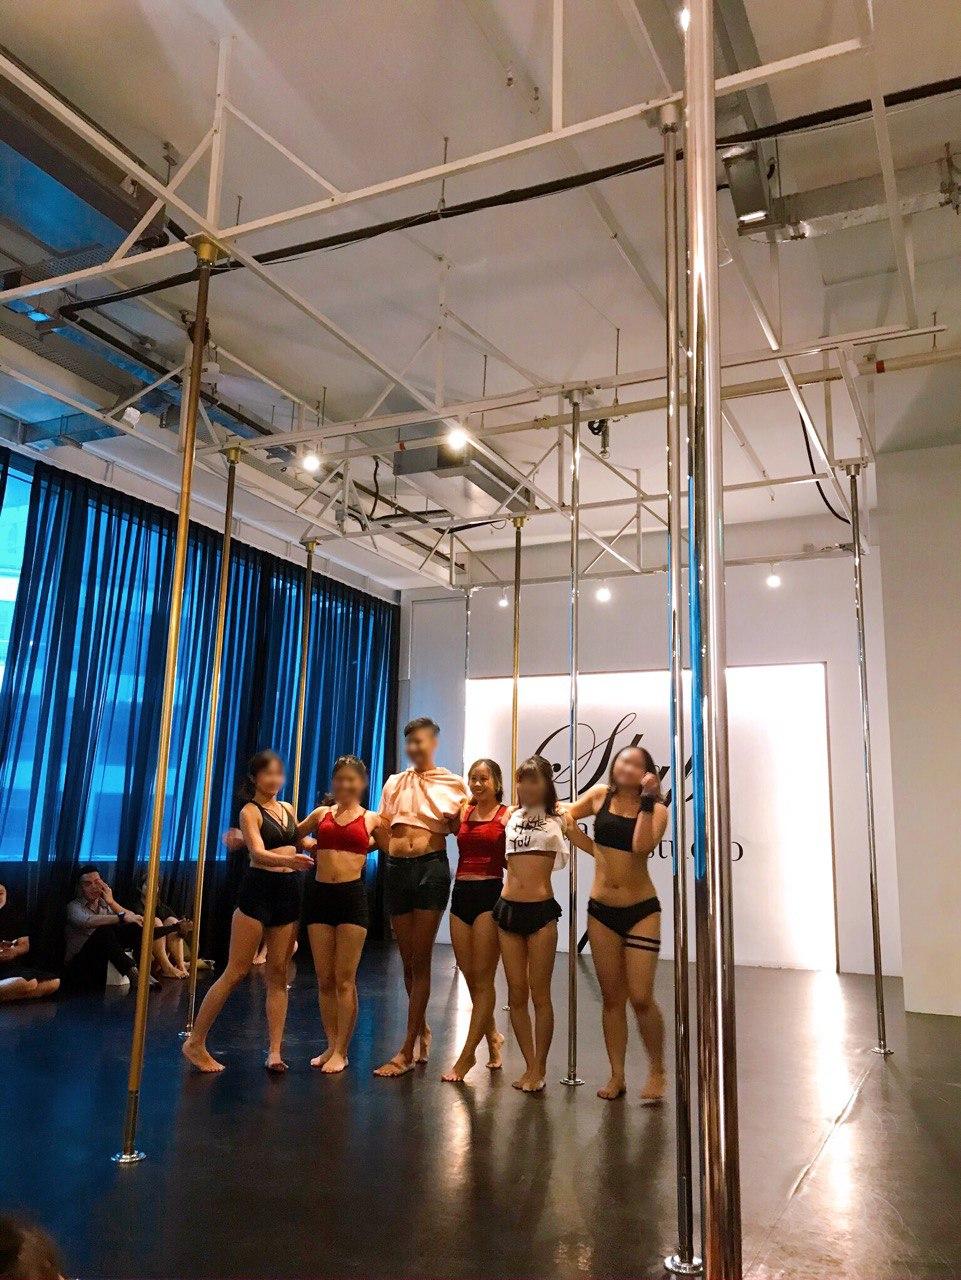 pole dance performance slap studio intro